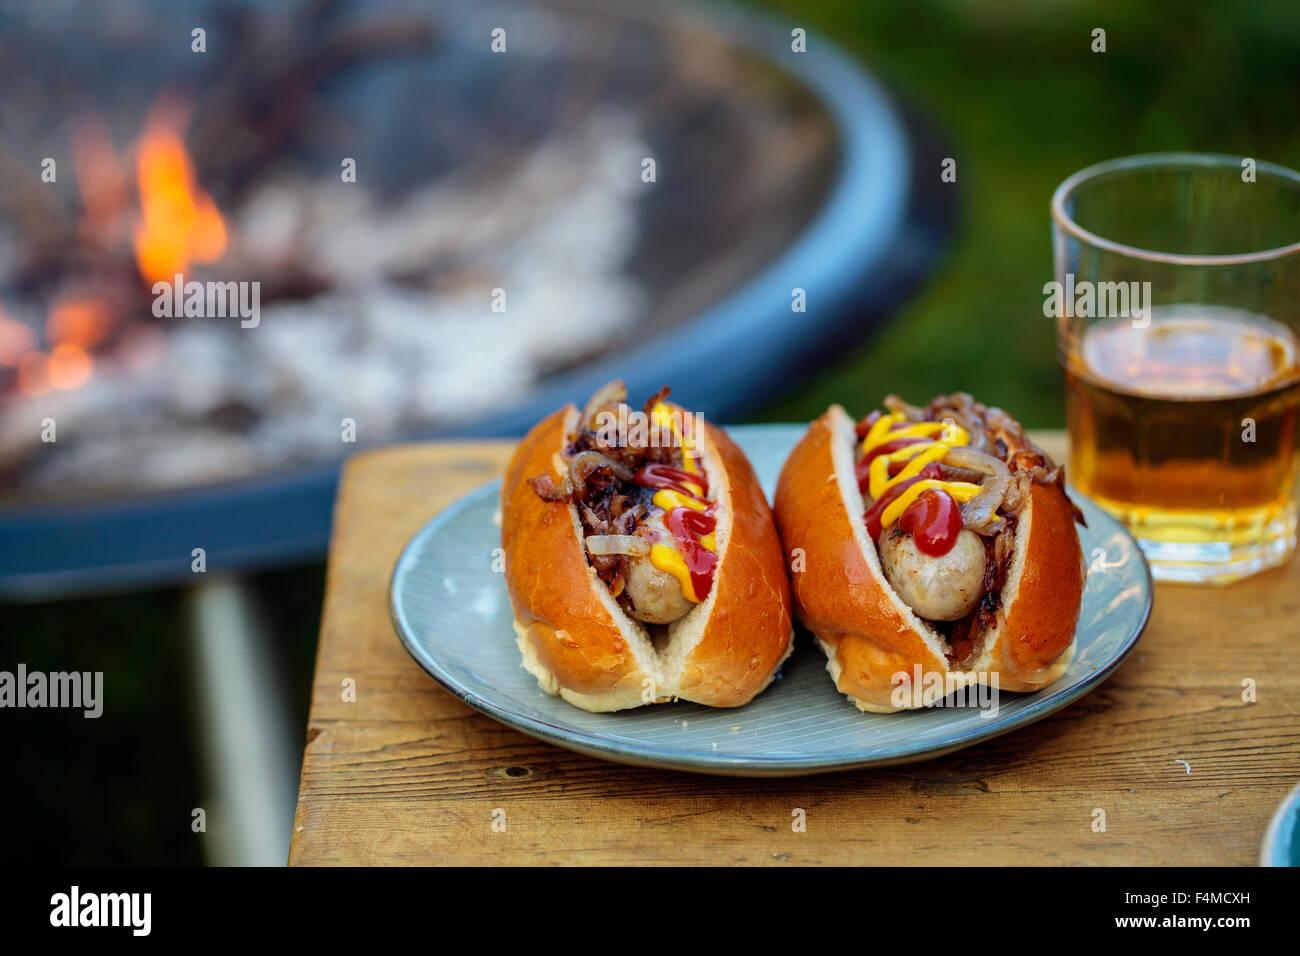 Hot-dogs avec des oignons frits Photo Stock